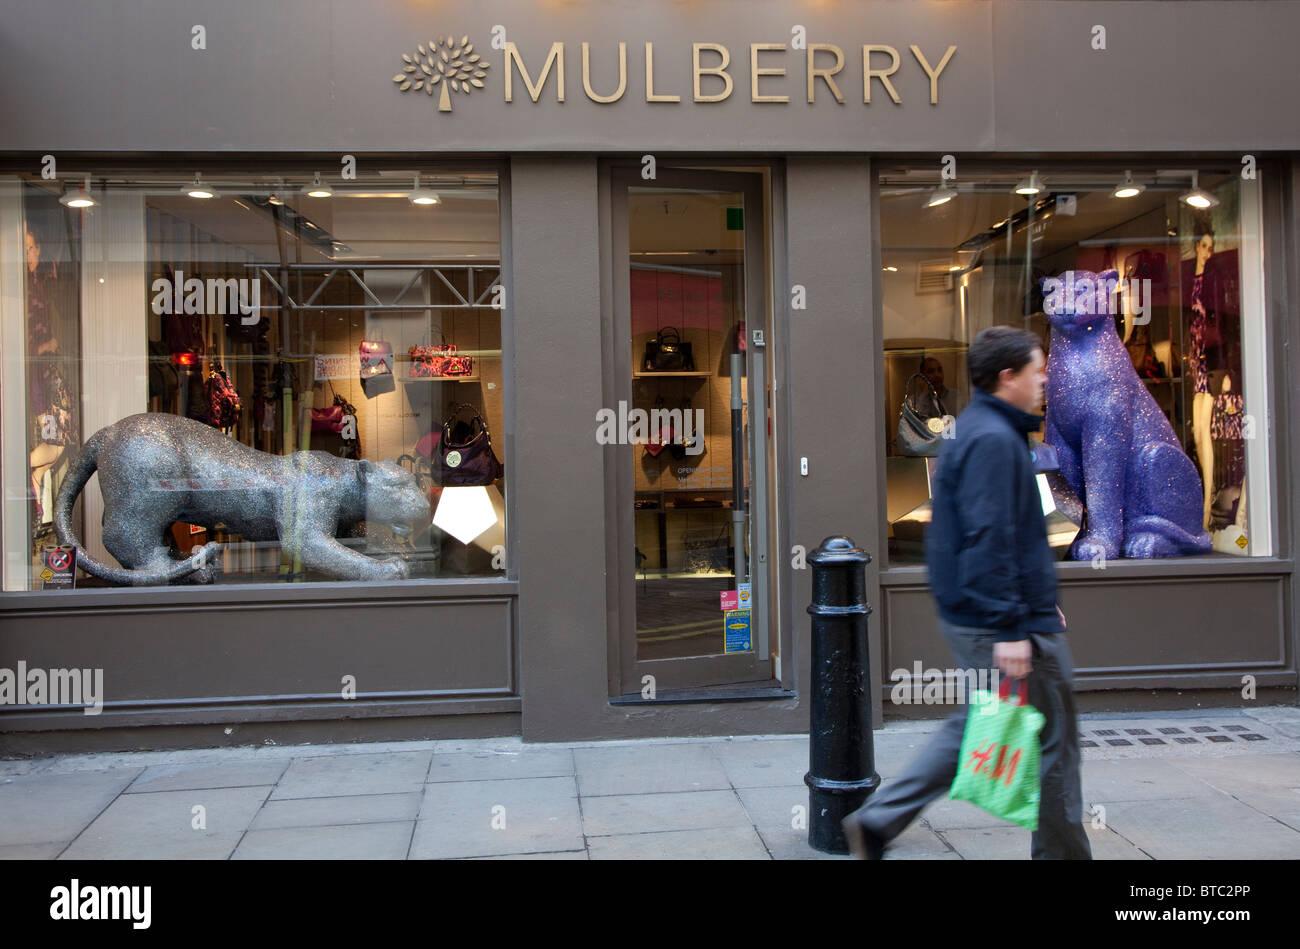 666ce08e772 Mulberry handbag store, Covent Garden, London Stock Photo: 32227742 ...